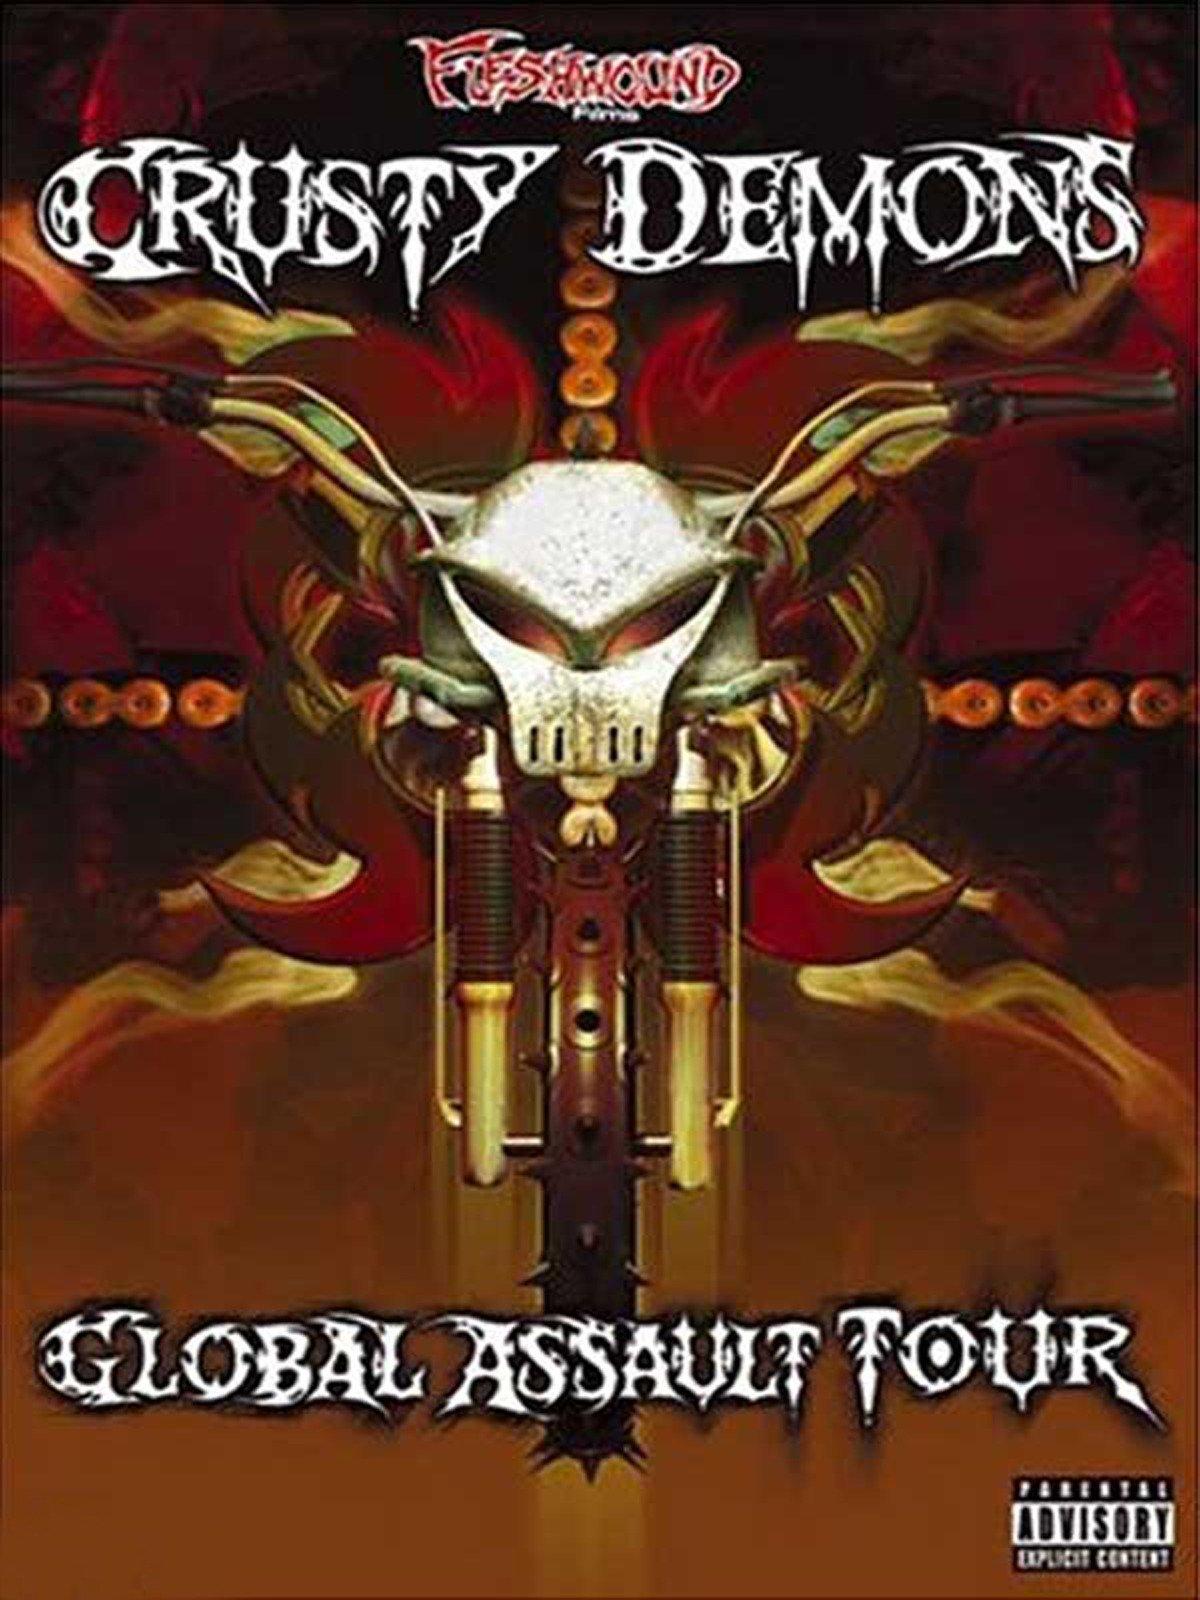 Watch Crusty Demons Of Dirt Global Assault Tour Prime Video